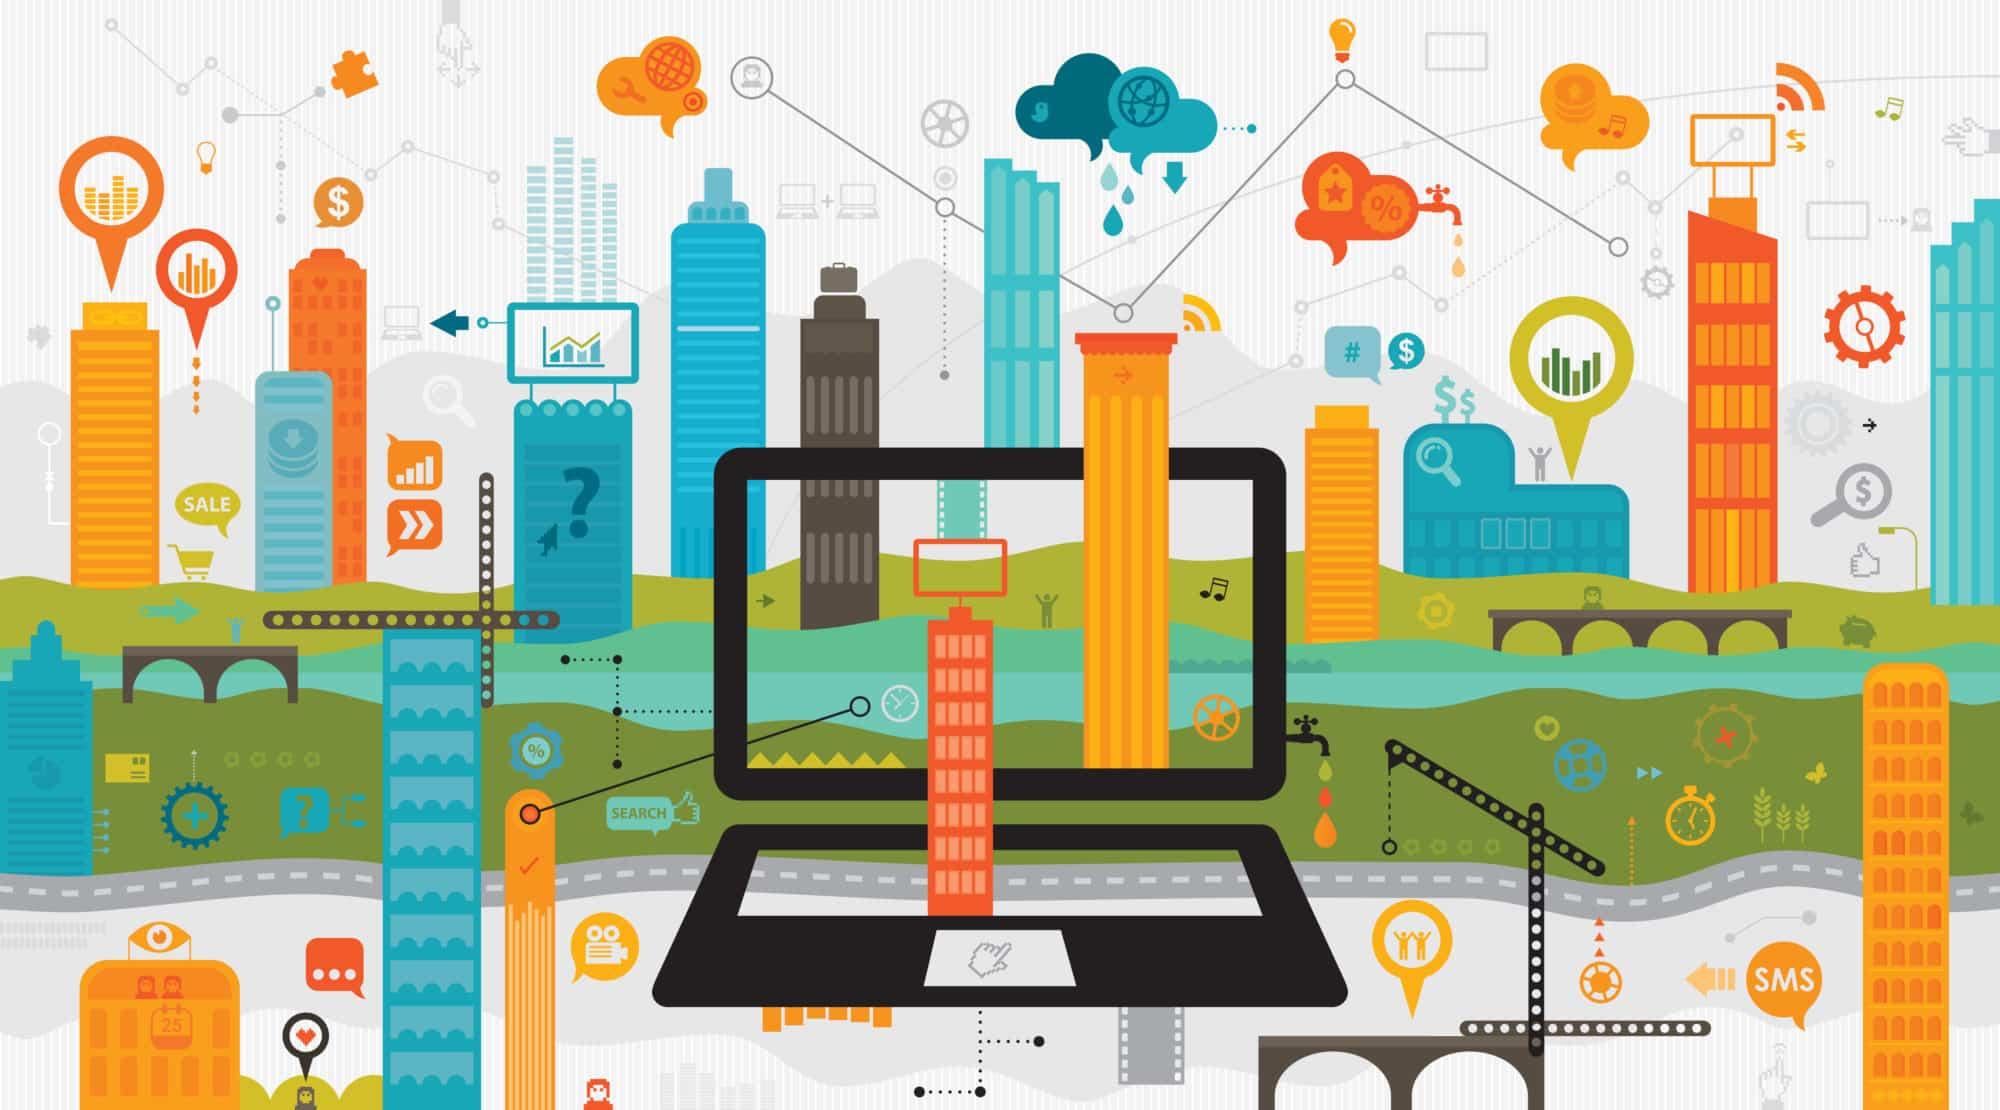 IoT, интернет-маркетинг, интернет вещей, тренды2016